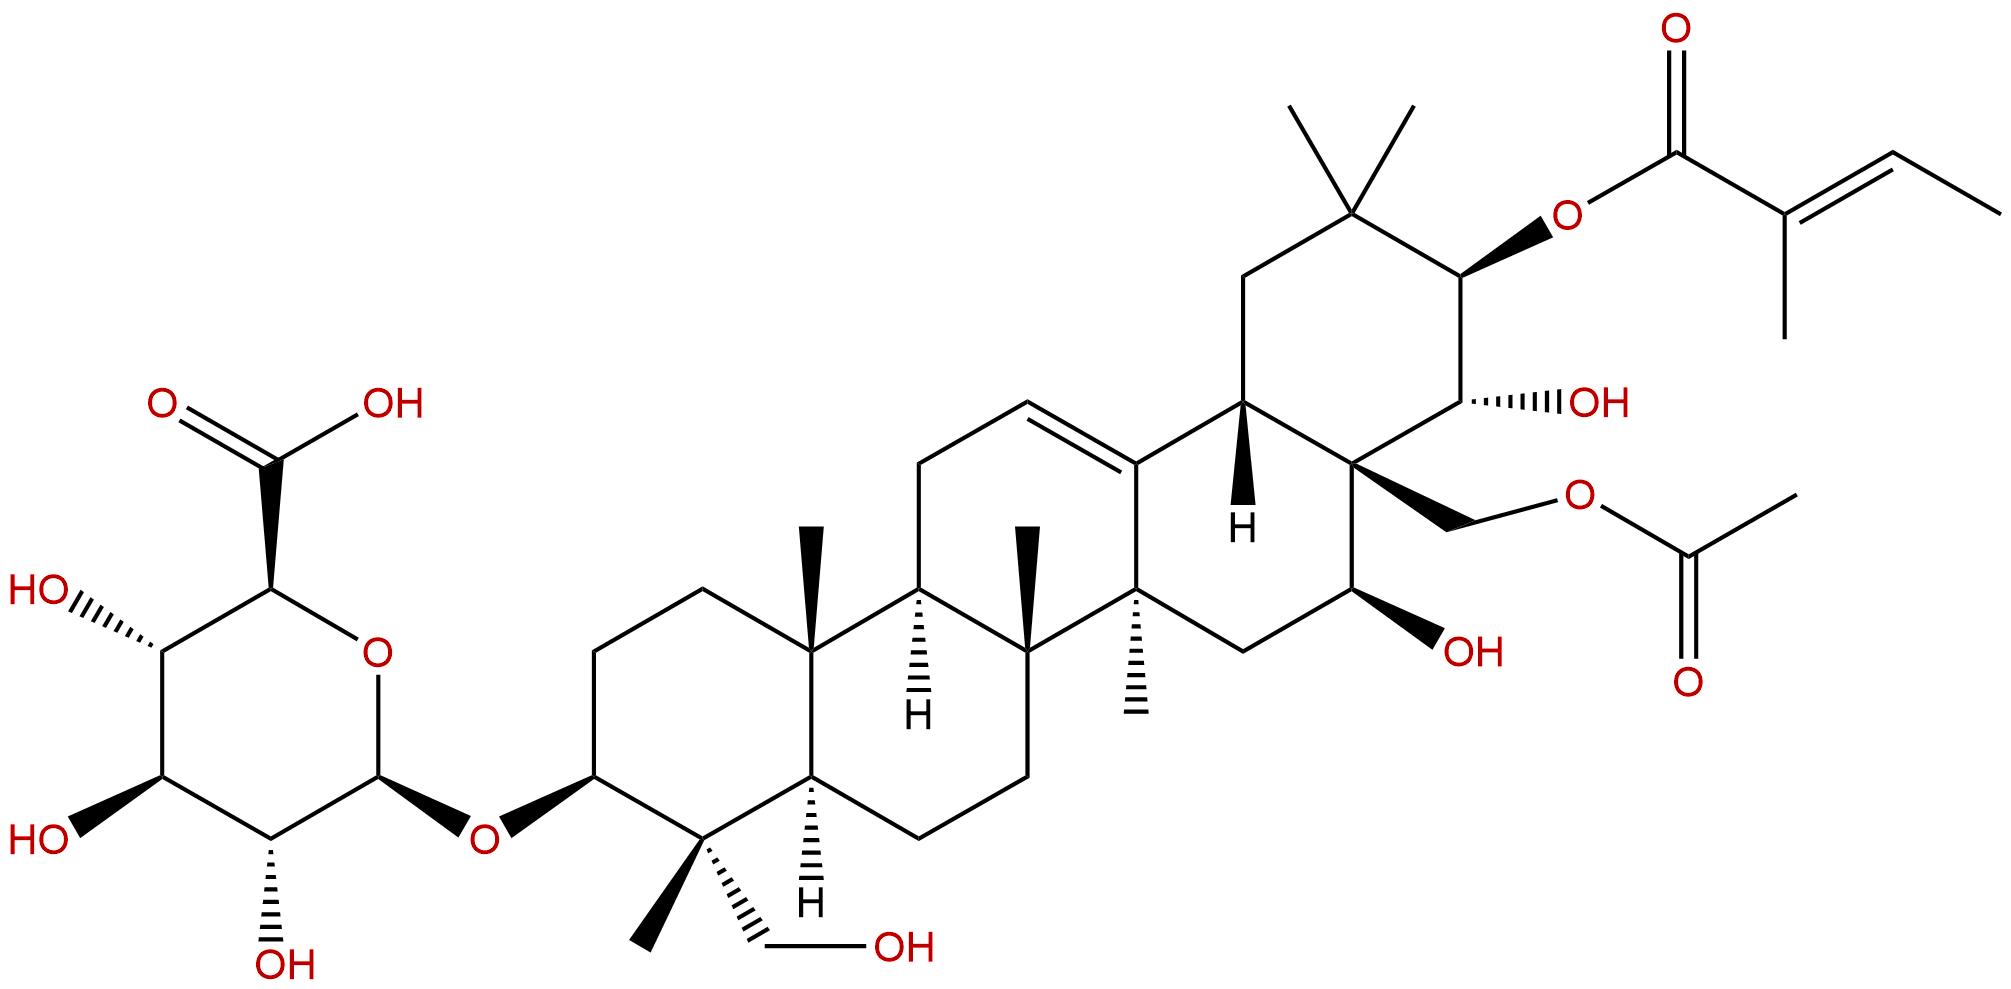 Gymnemic acid I